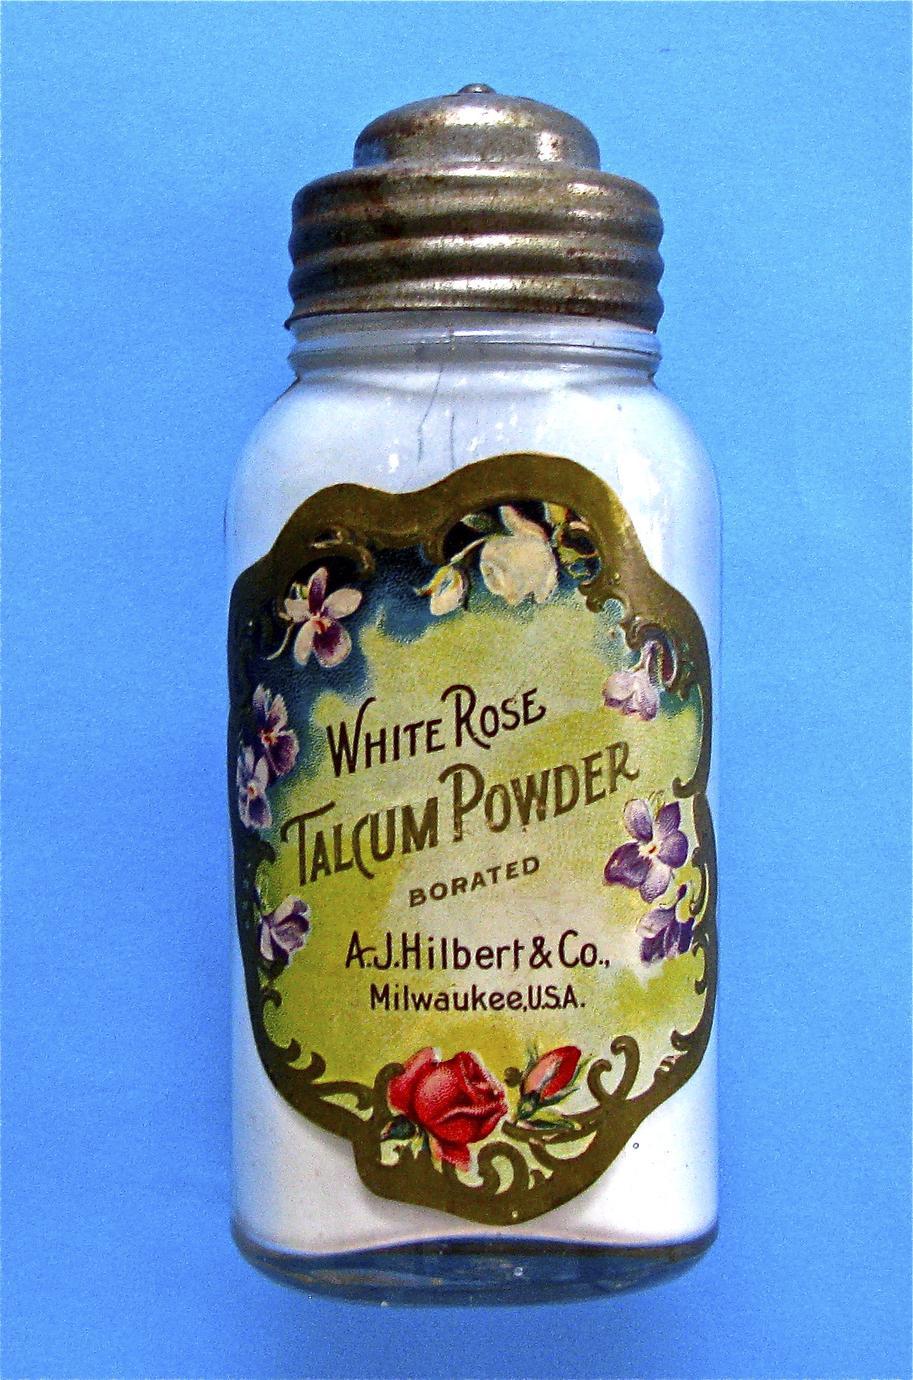 White Rose talcum powder